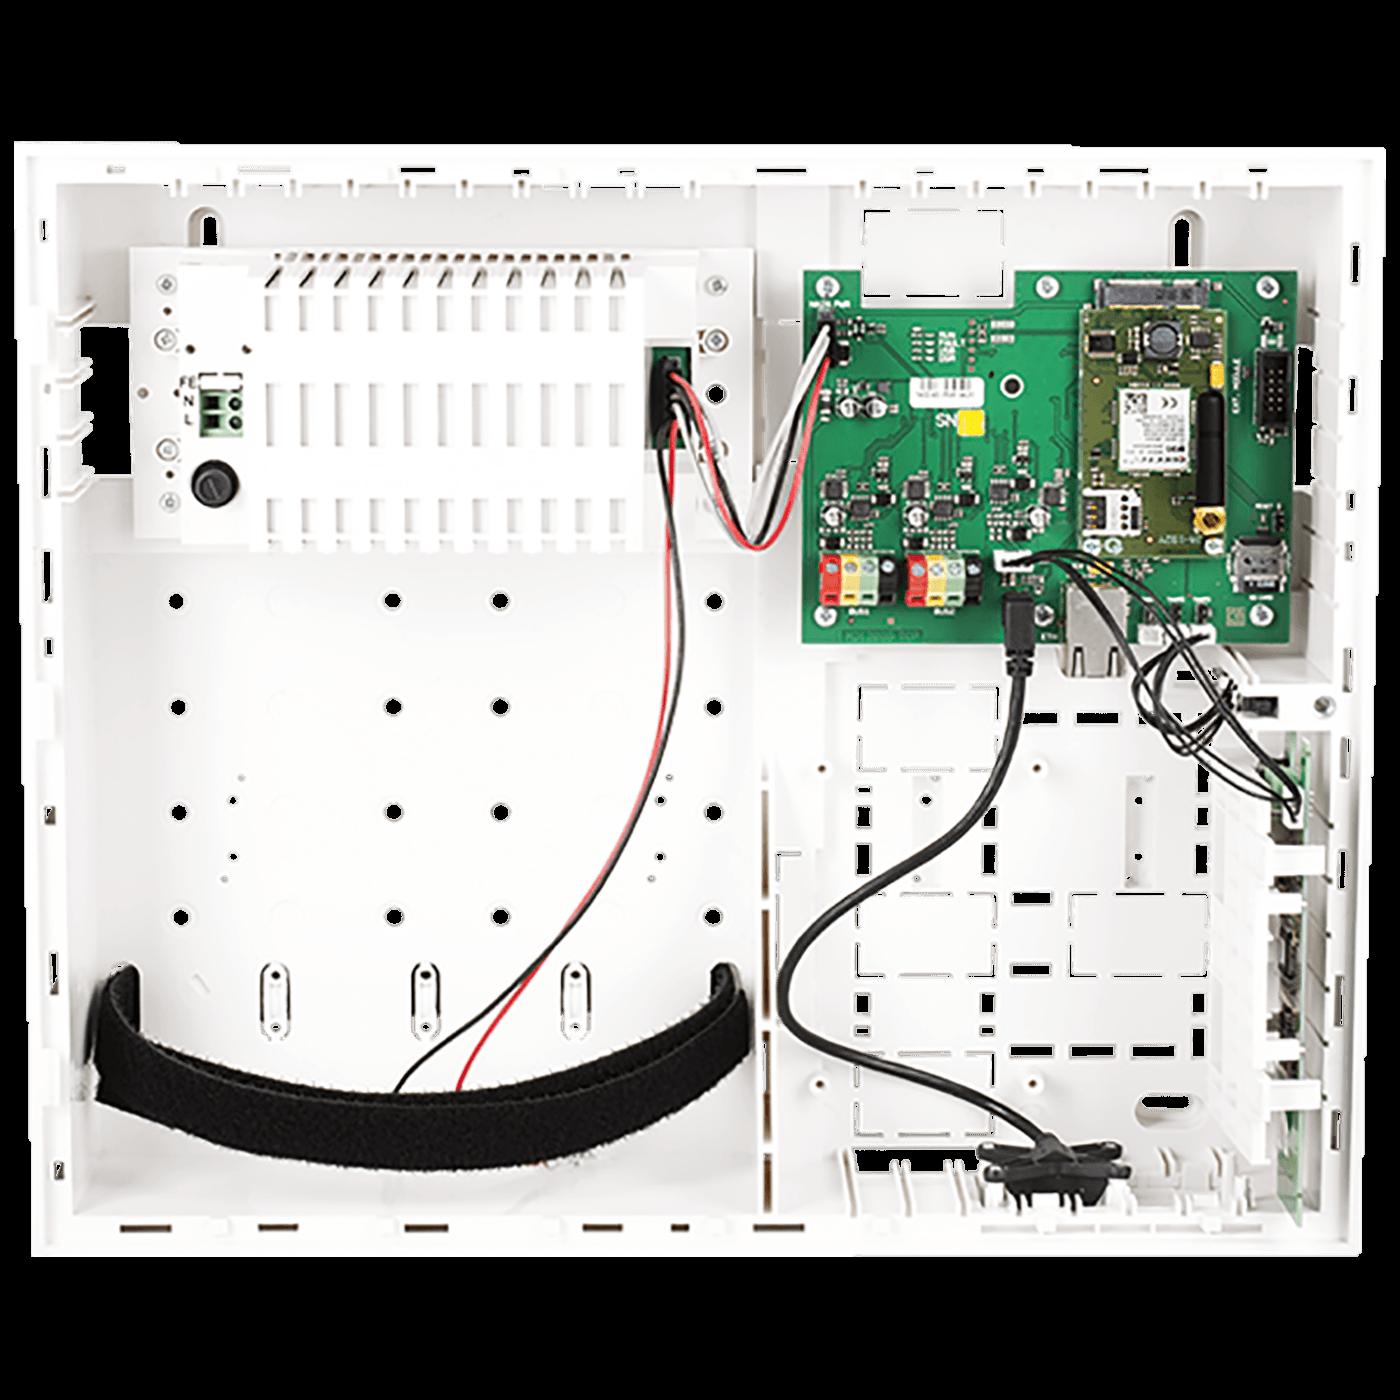 Kontrolna ploča sa LAN/GSM/GPRS komunikatorom i radio modul